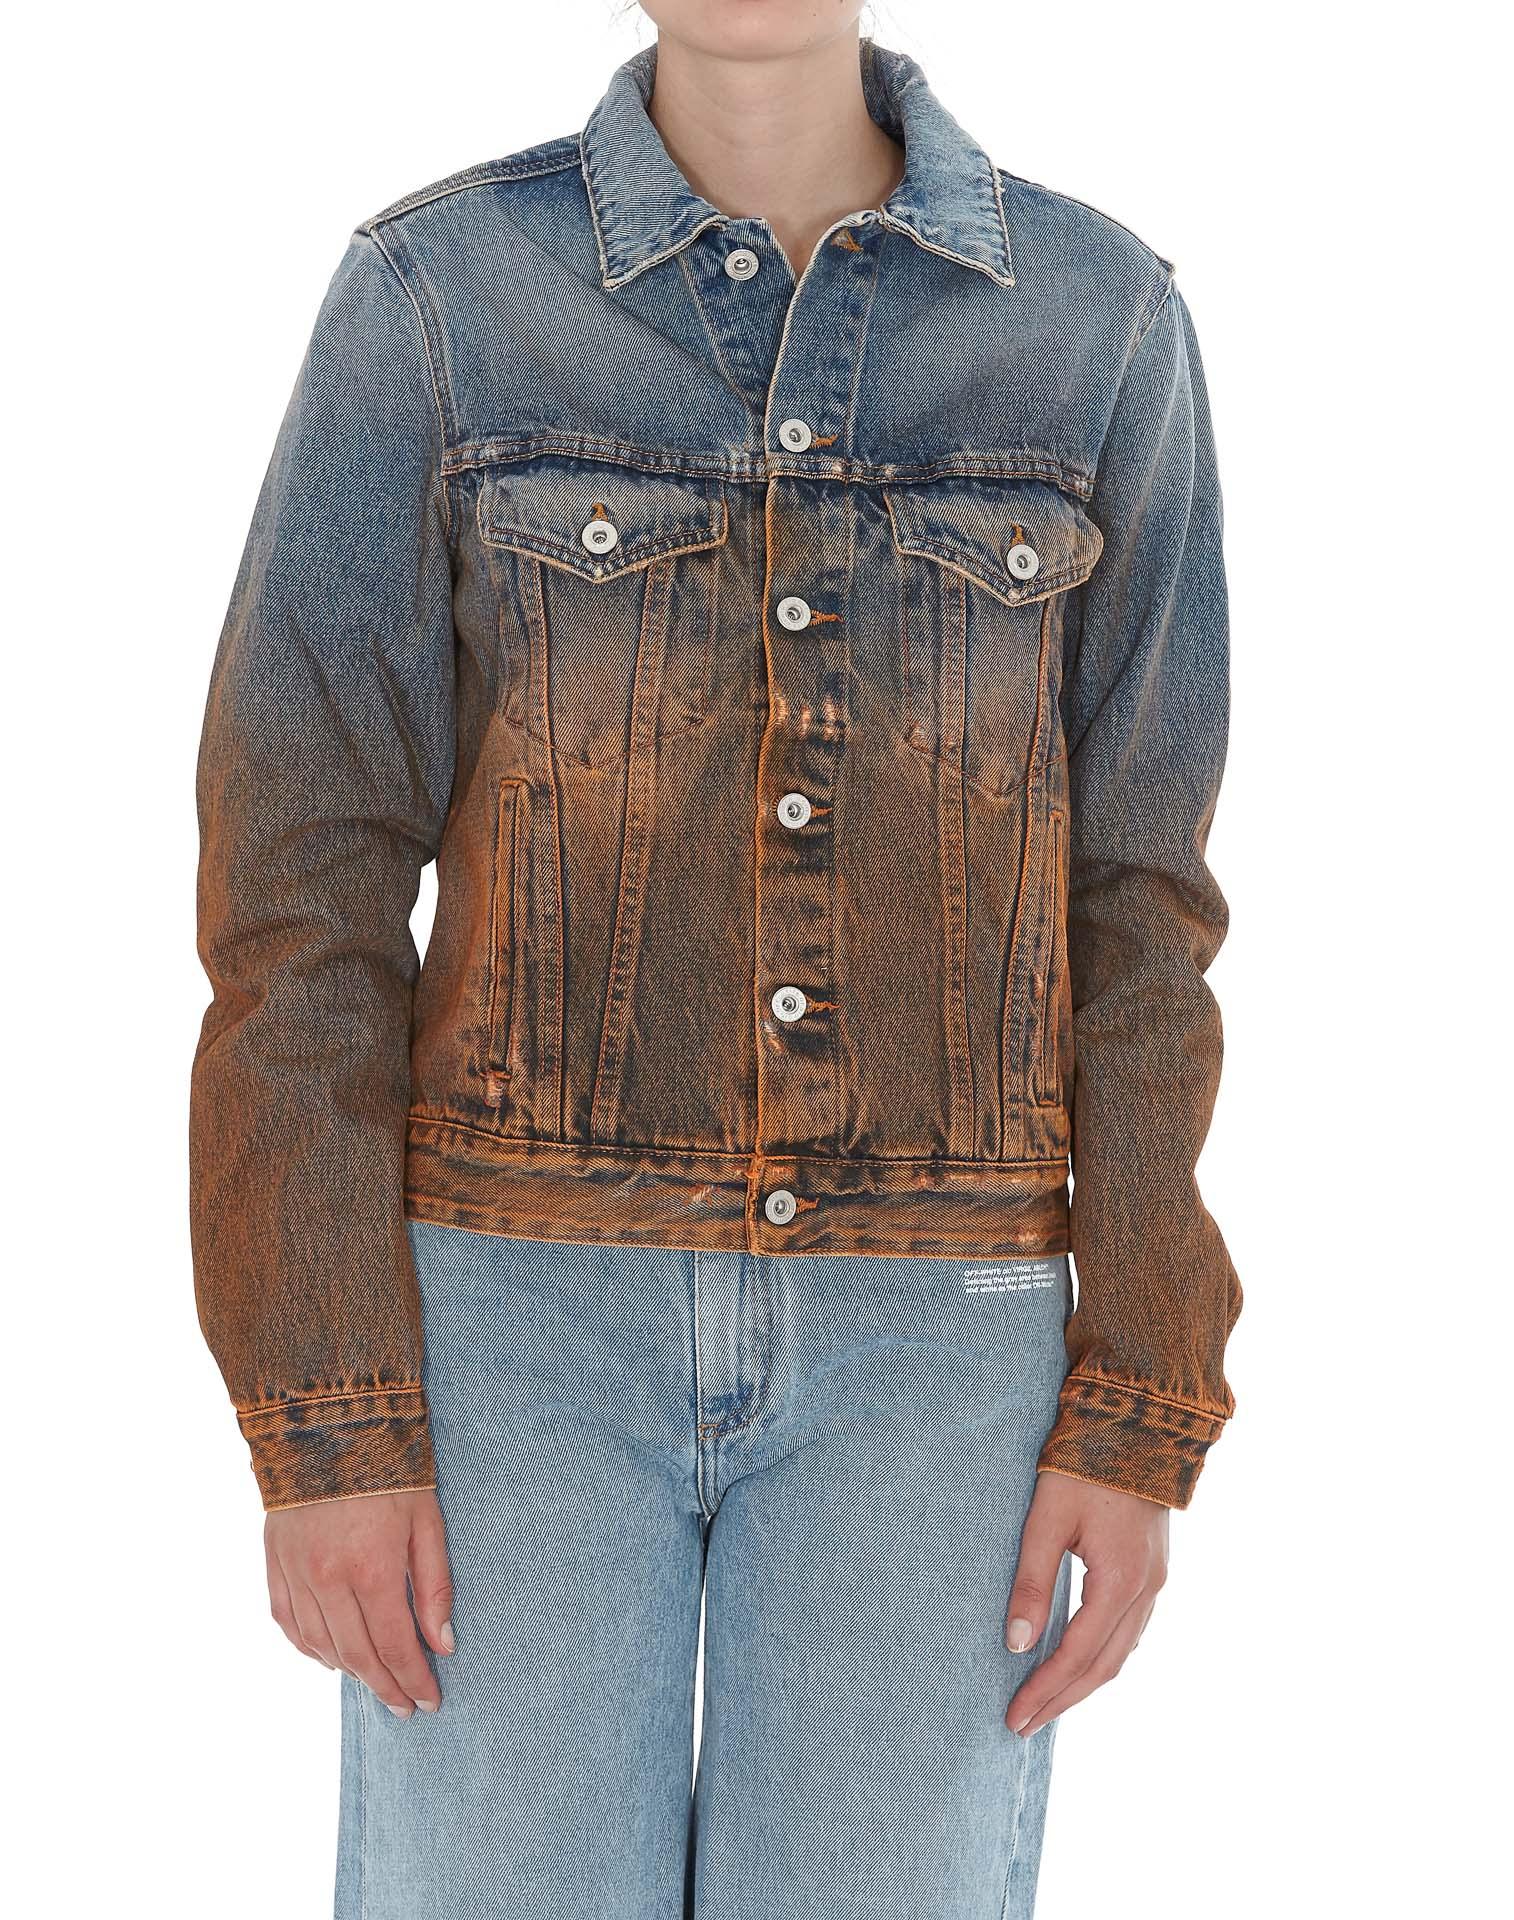 Photo of  Off-white Denim Jacket- shop Off-White jackets online sales